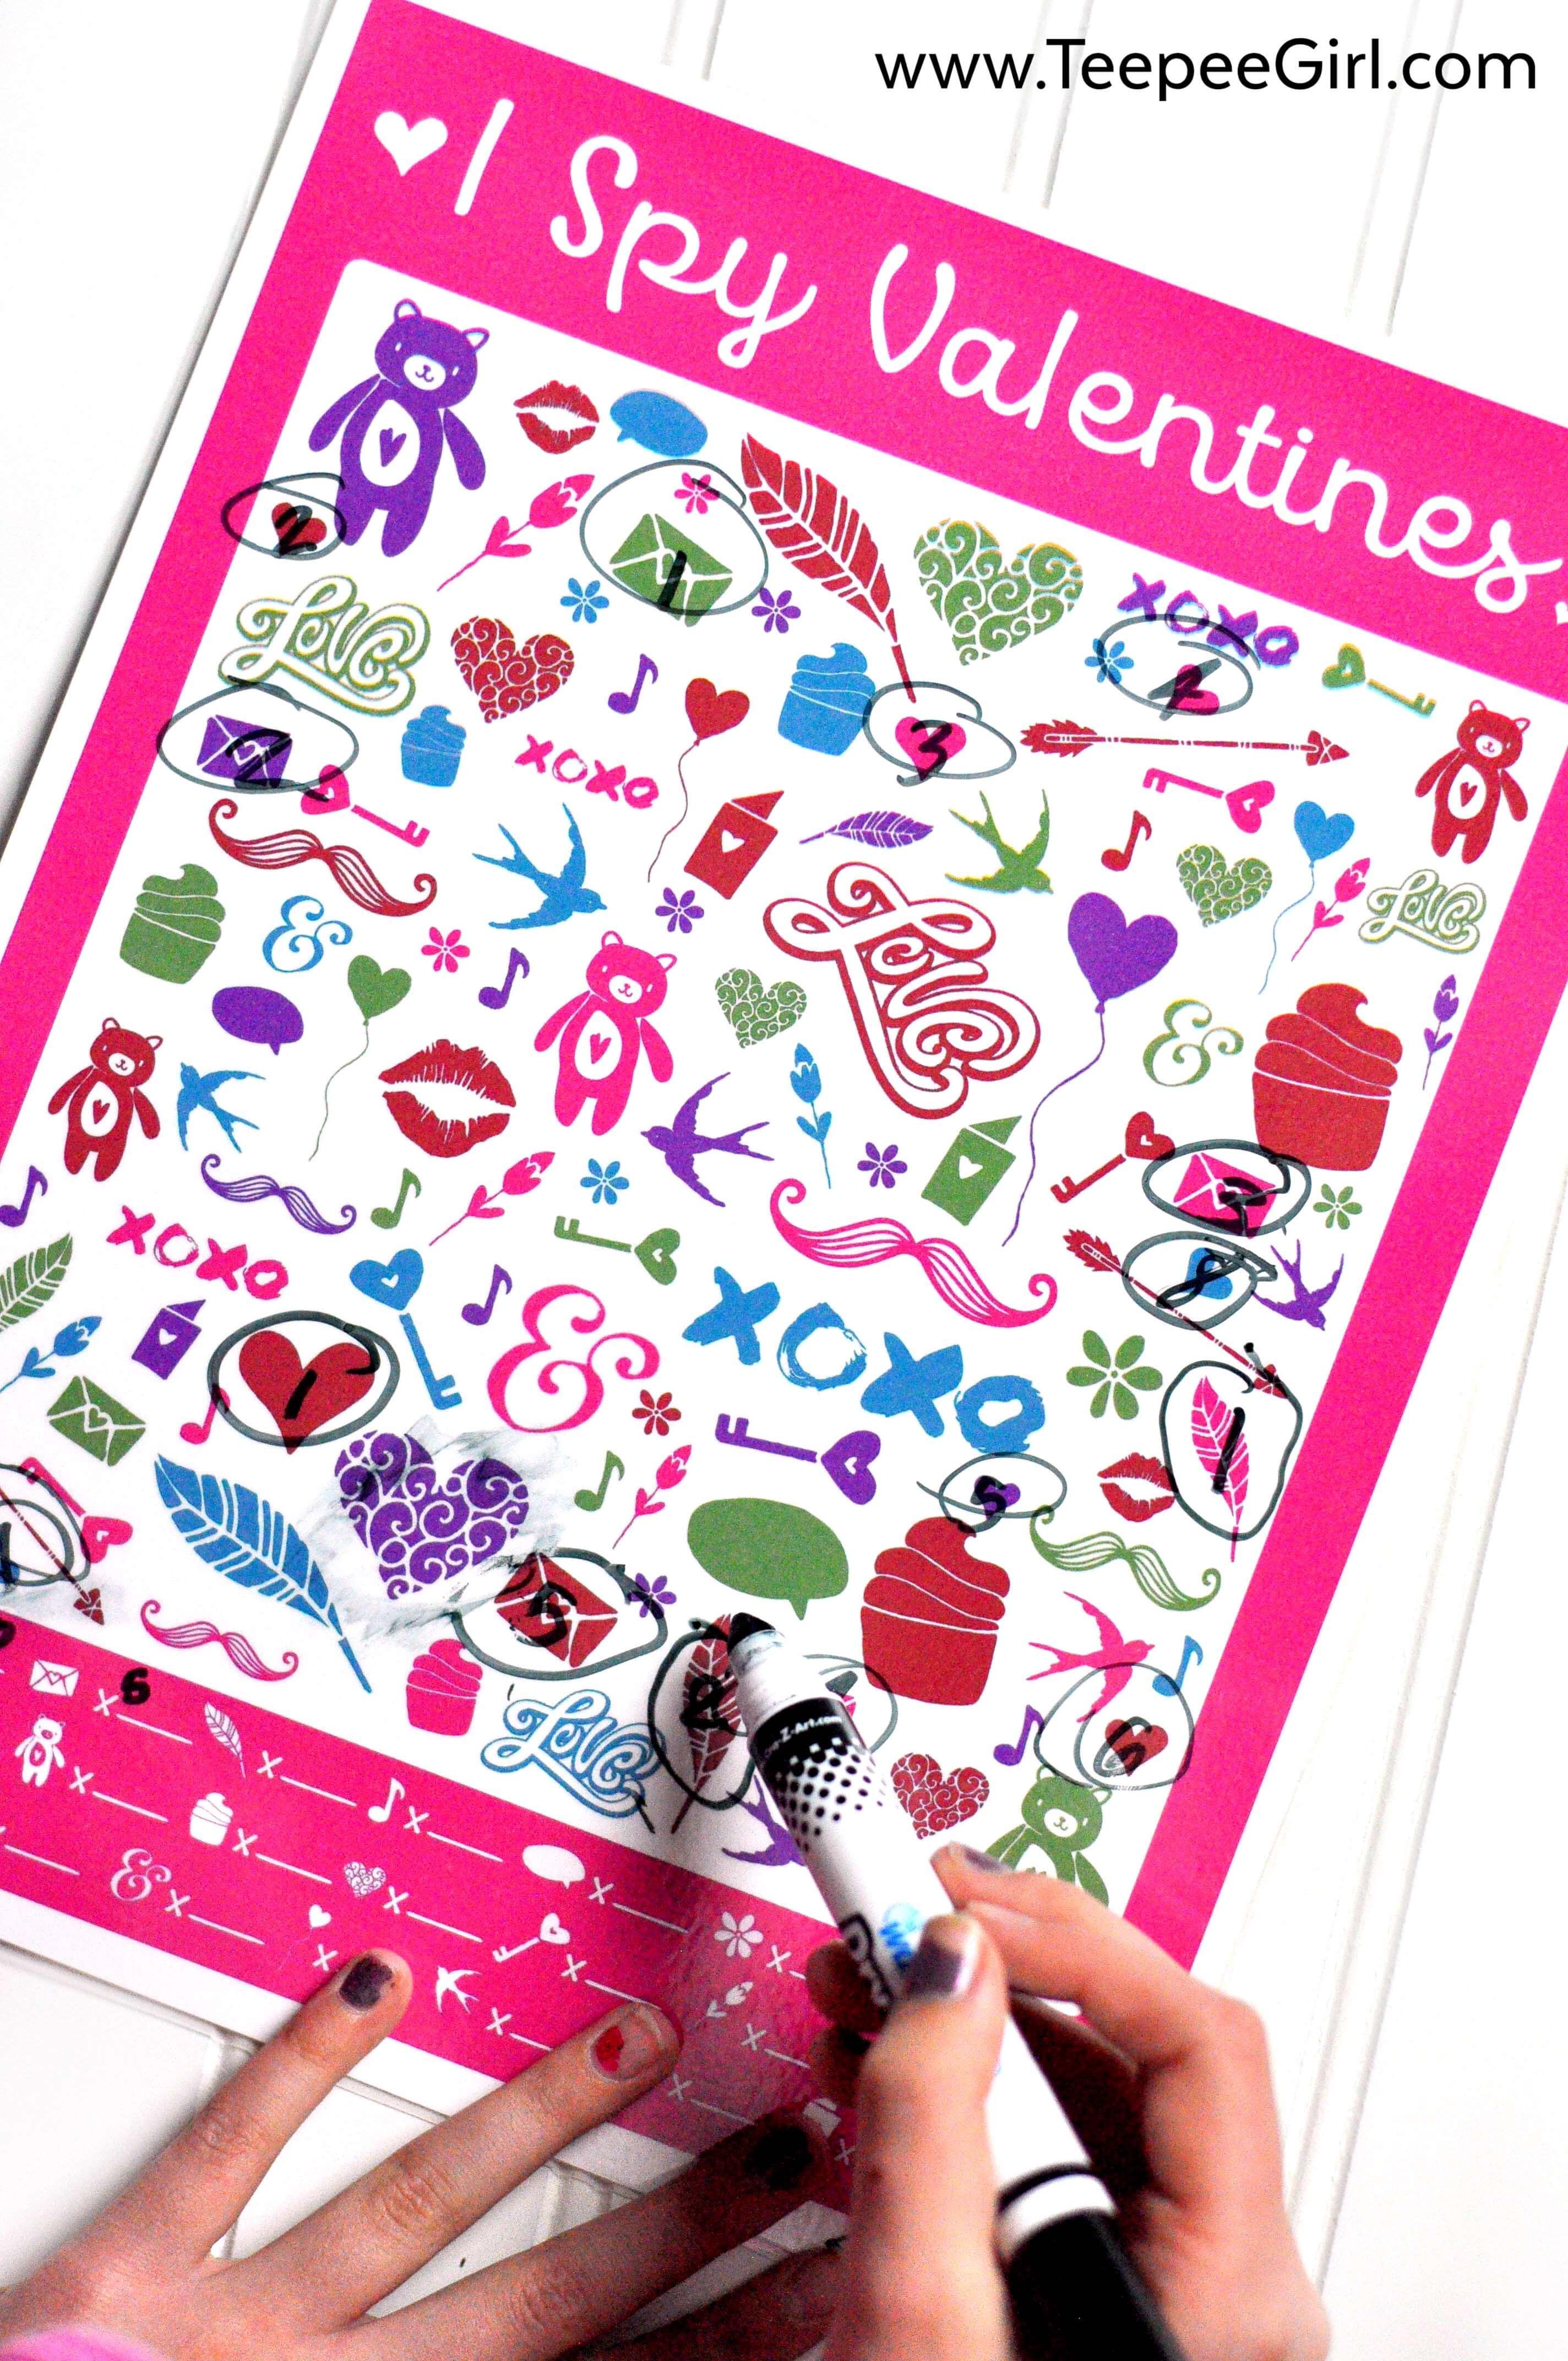 Free I Spy Valentines Printable Game